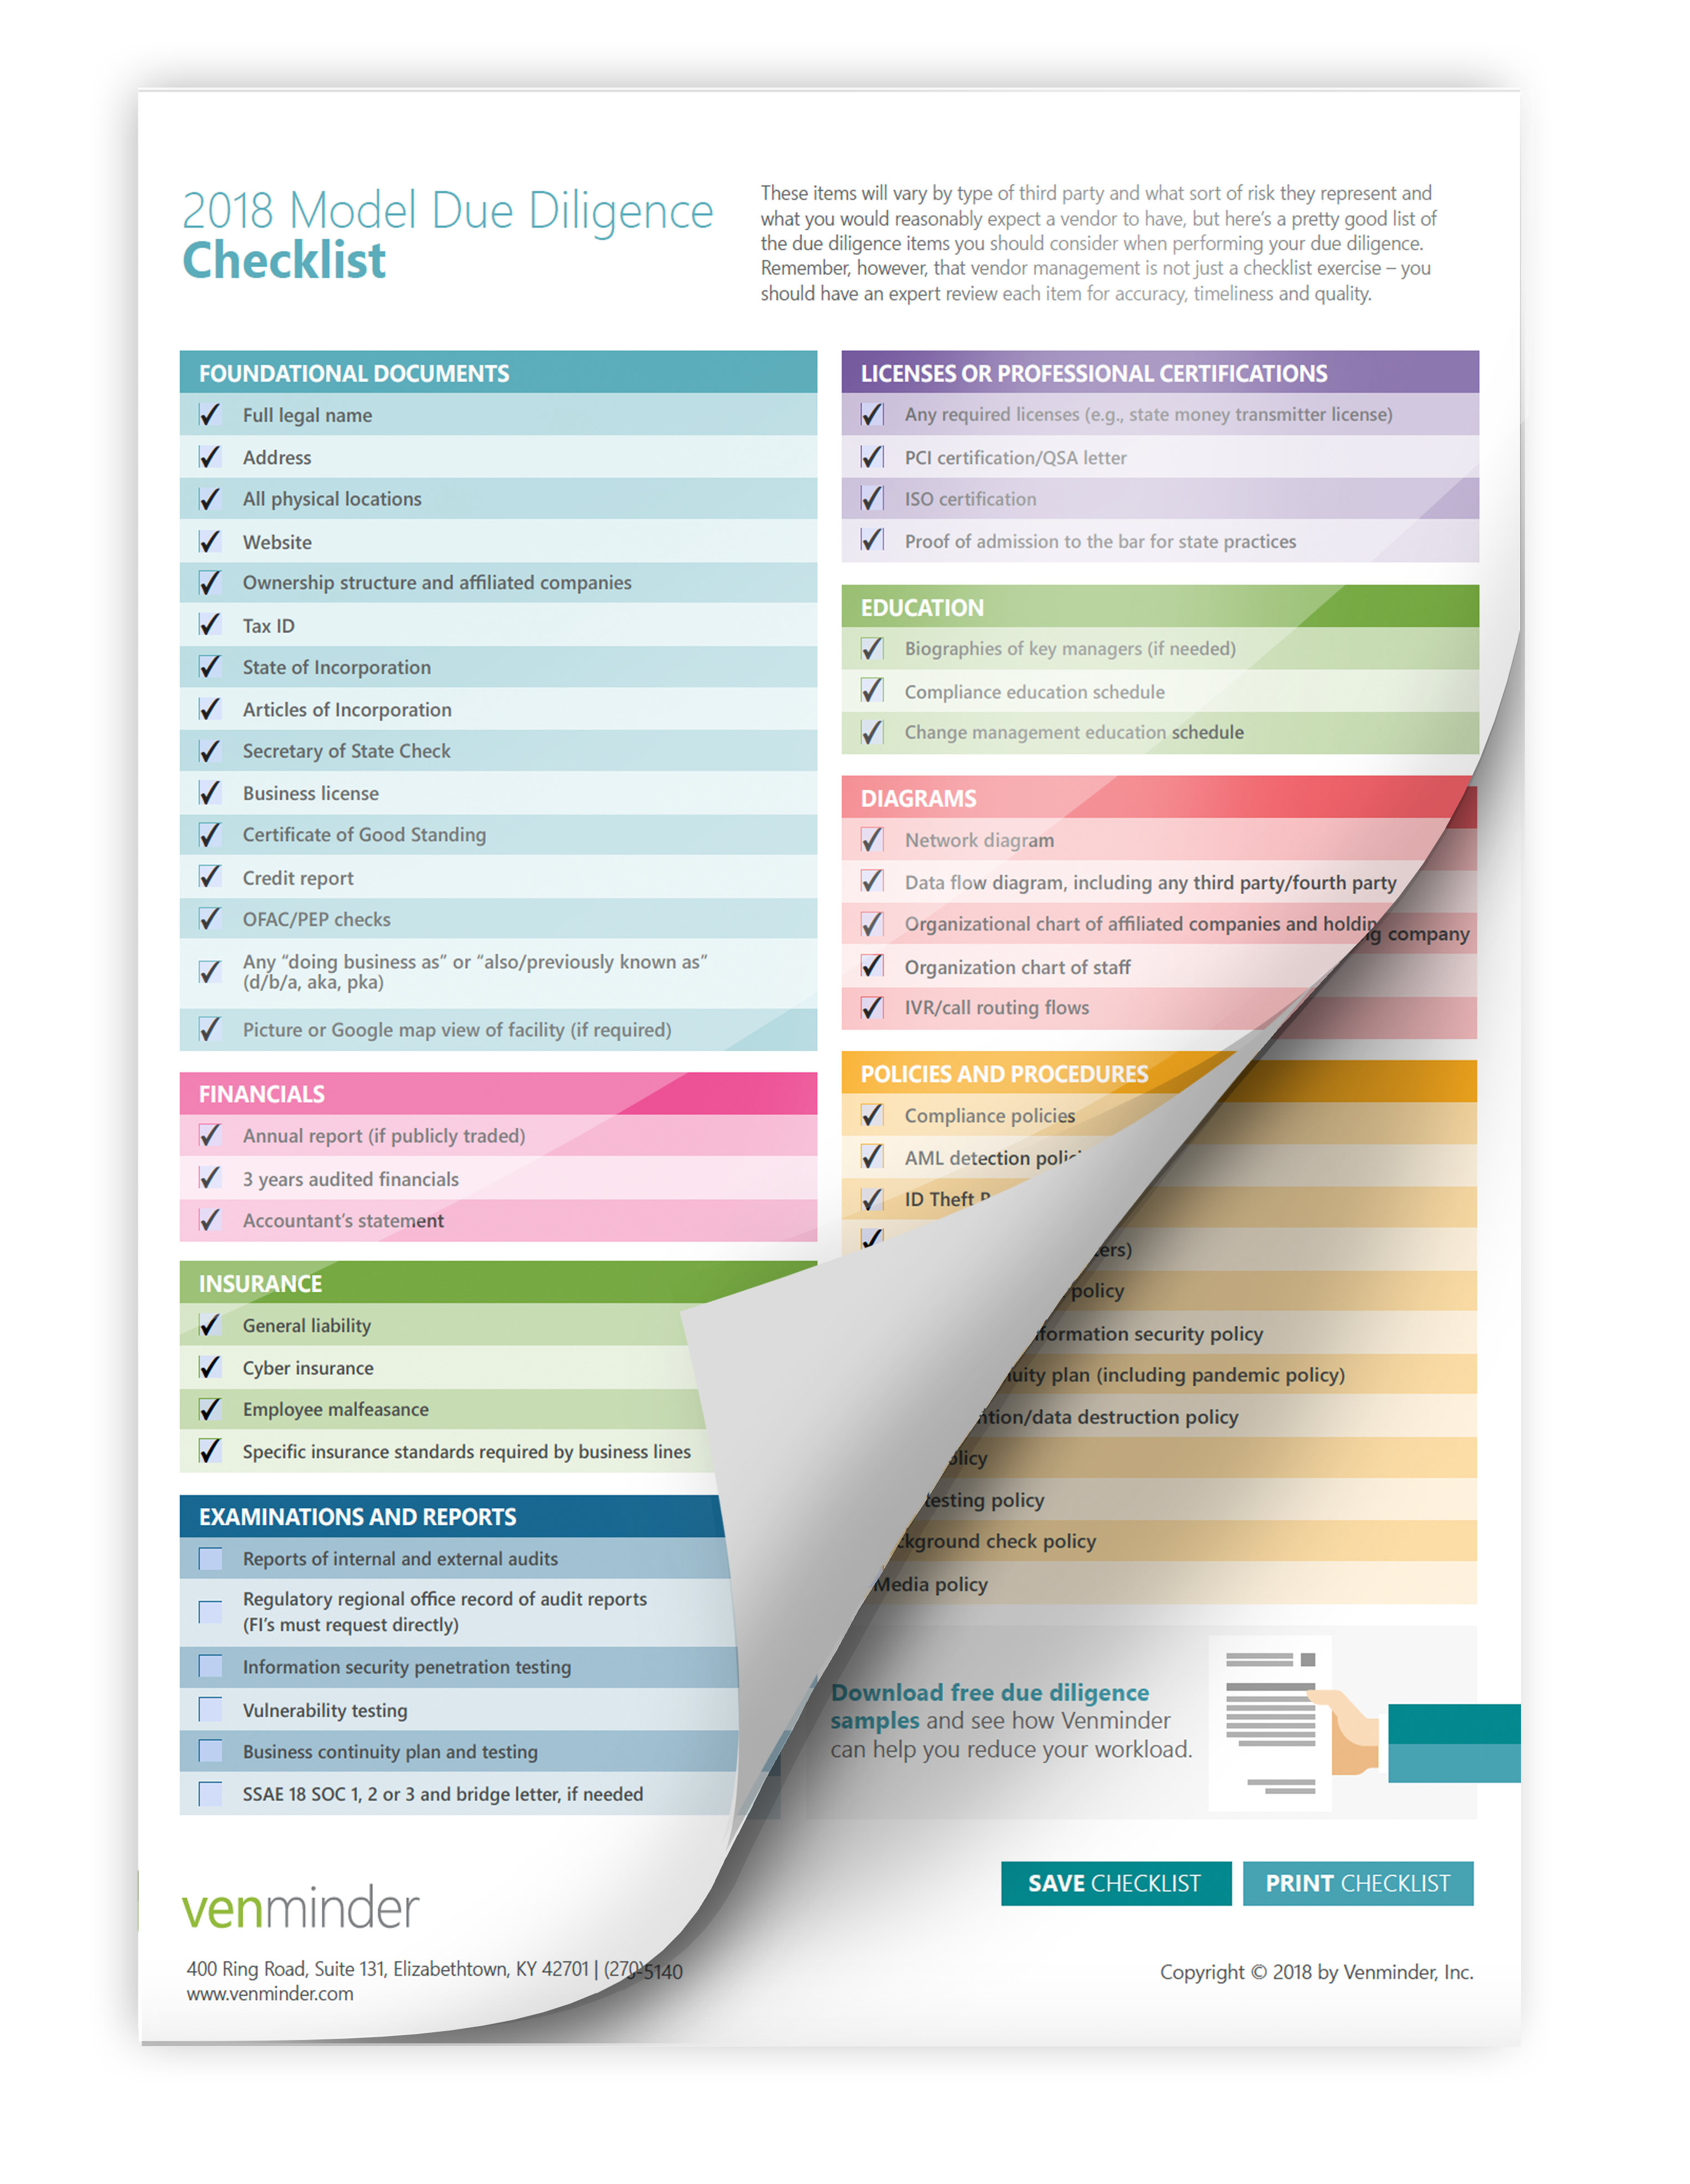 2017 vendor due diligence checklist for bank credit union mortgage lenders